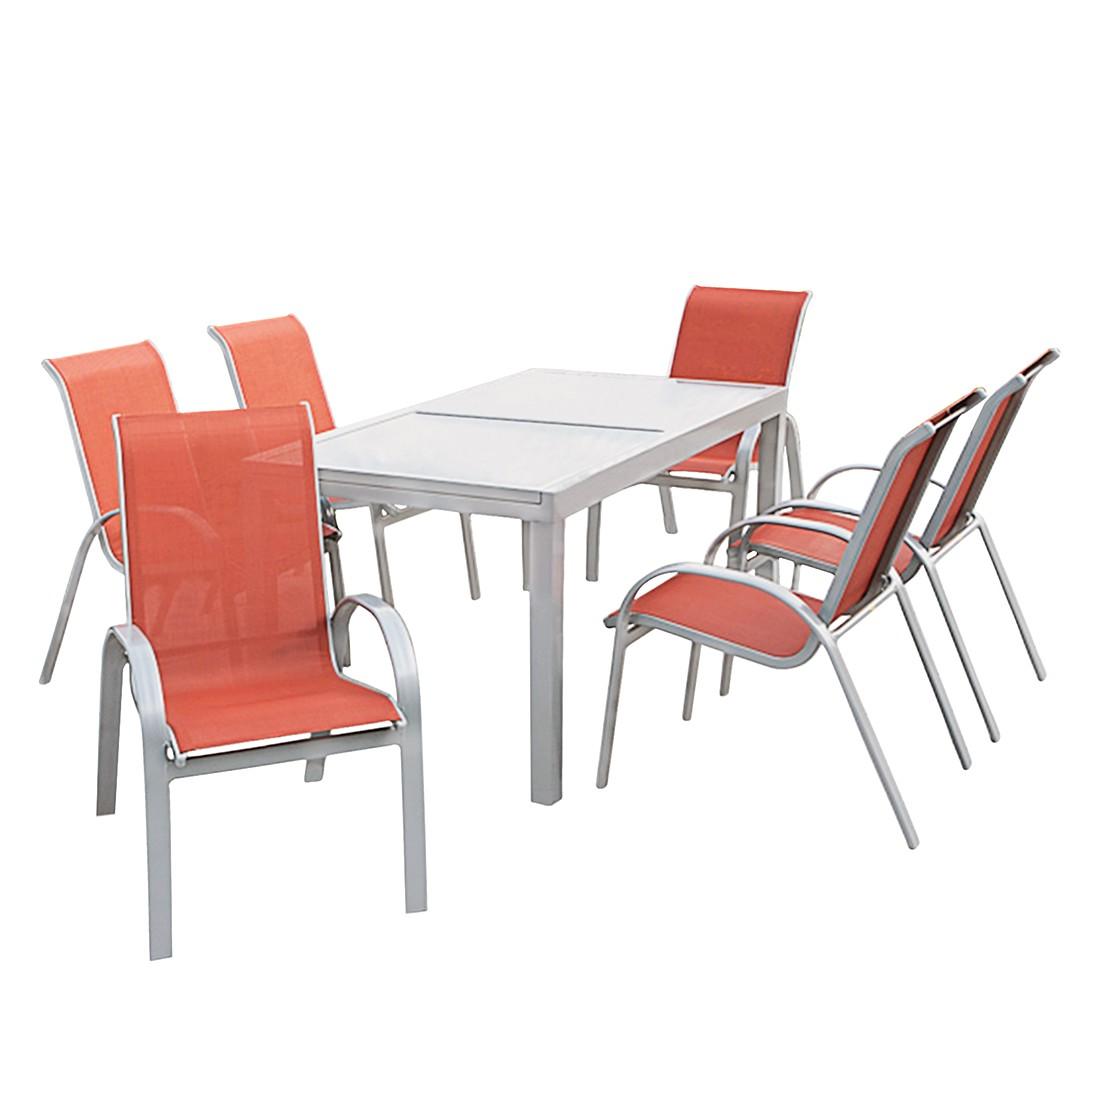 Essgruppe Amalfi II (7-teilig) - Aluminuim Silber/Kunstfasergeweb bei Home24 - Gartenmöbel